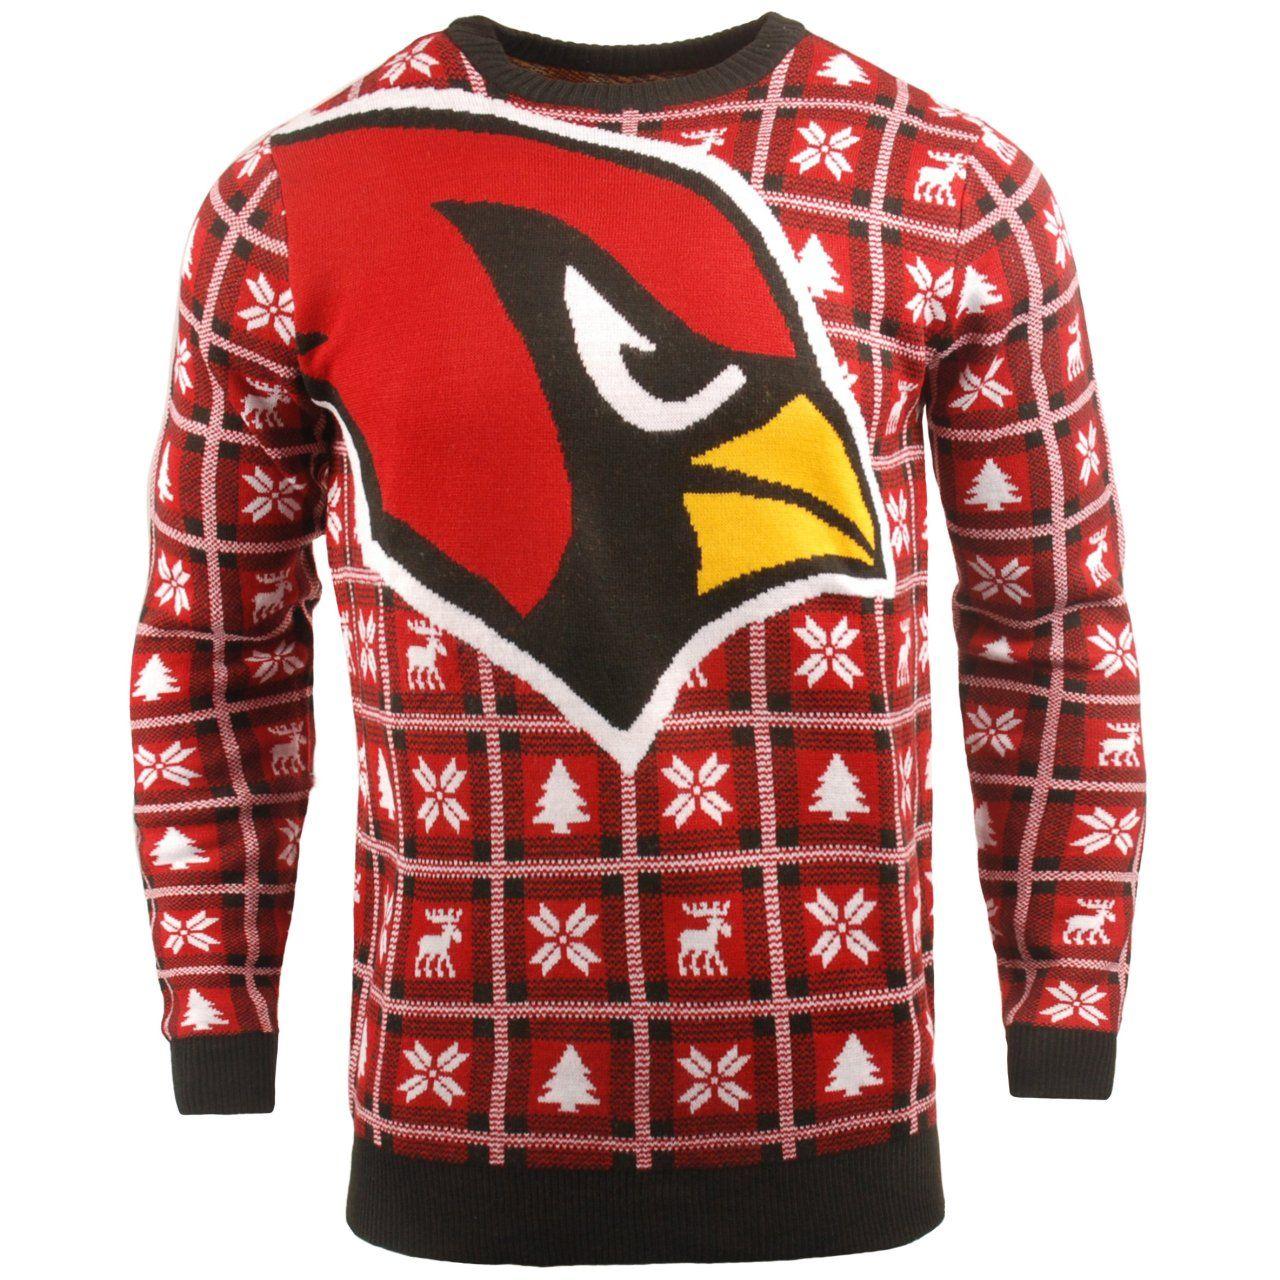 amfoo - NFL Ugly Sweater XMAS Strick Pullover - Arizona Cardinals